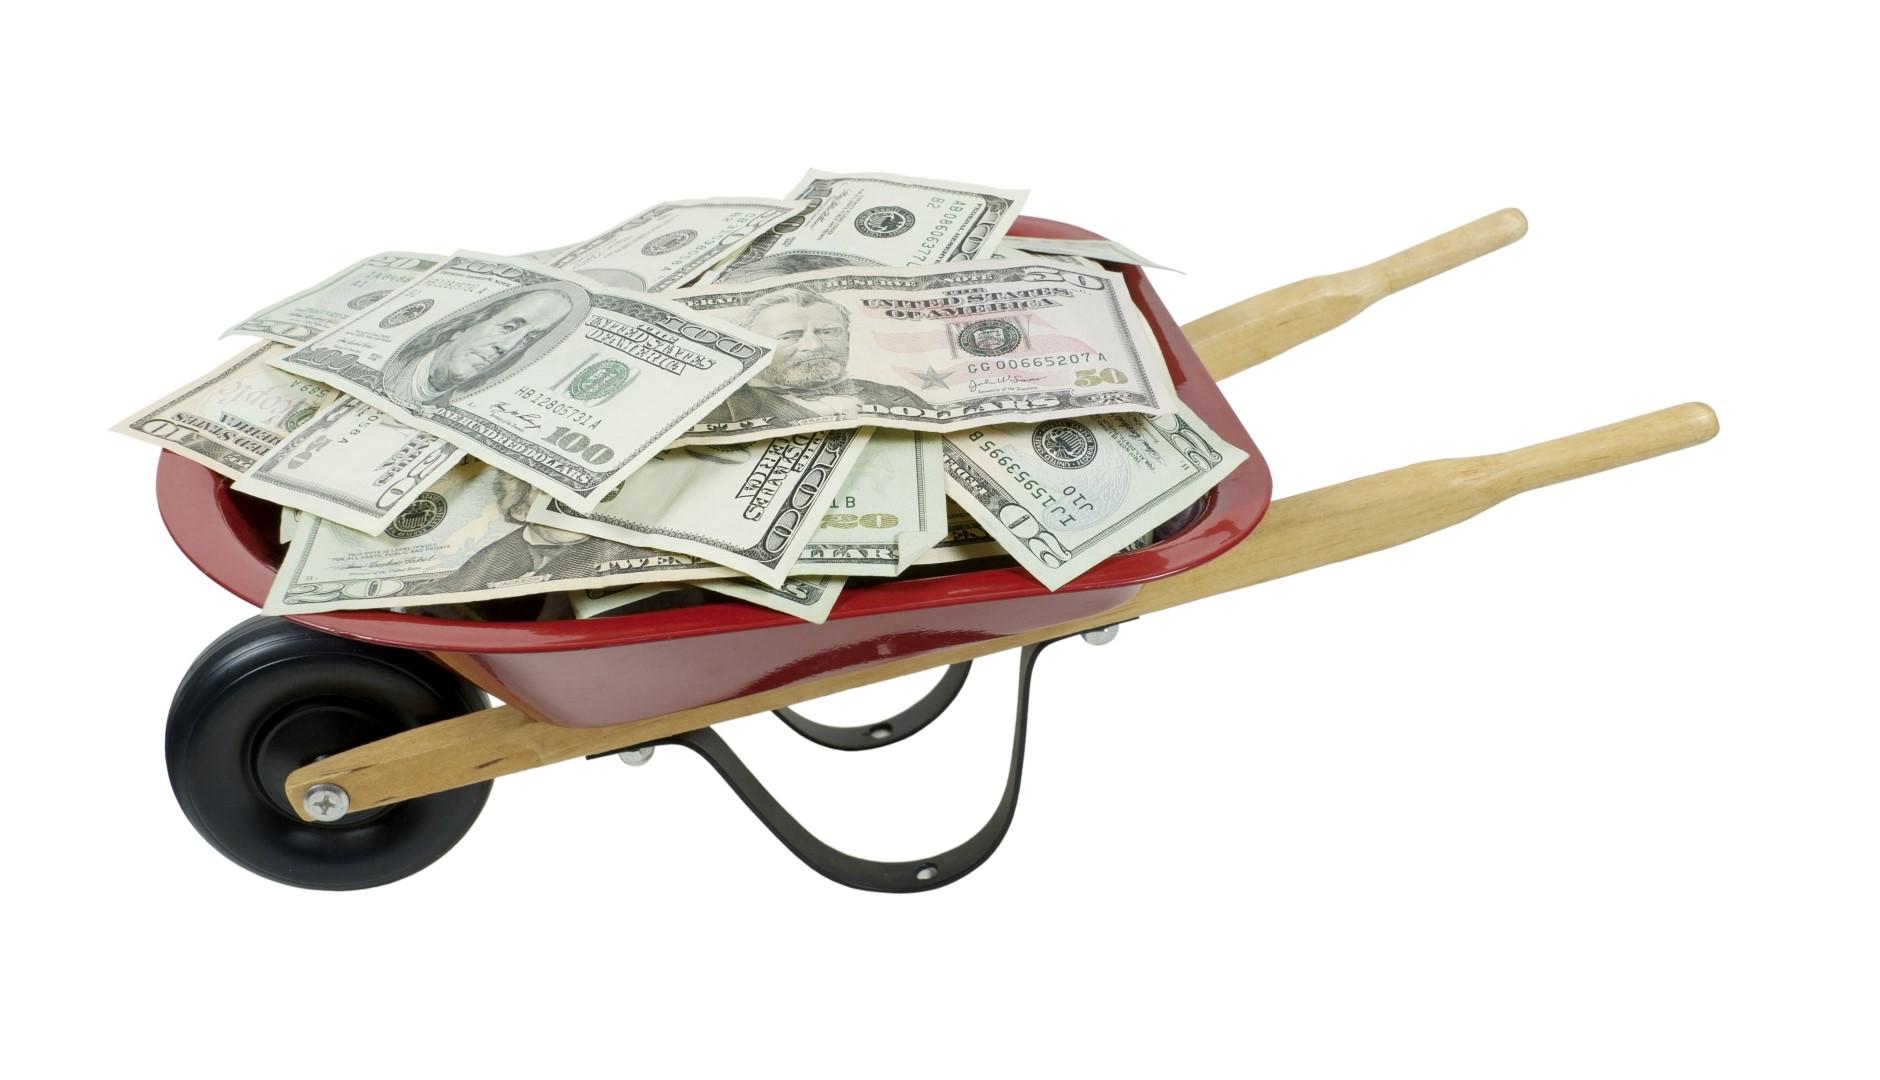 wheelbarrow-money-Large.jpg